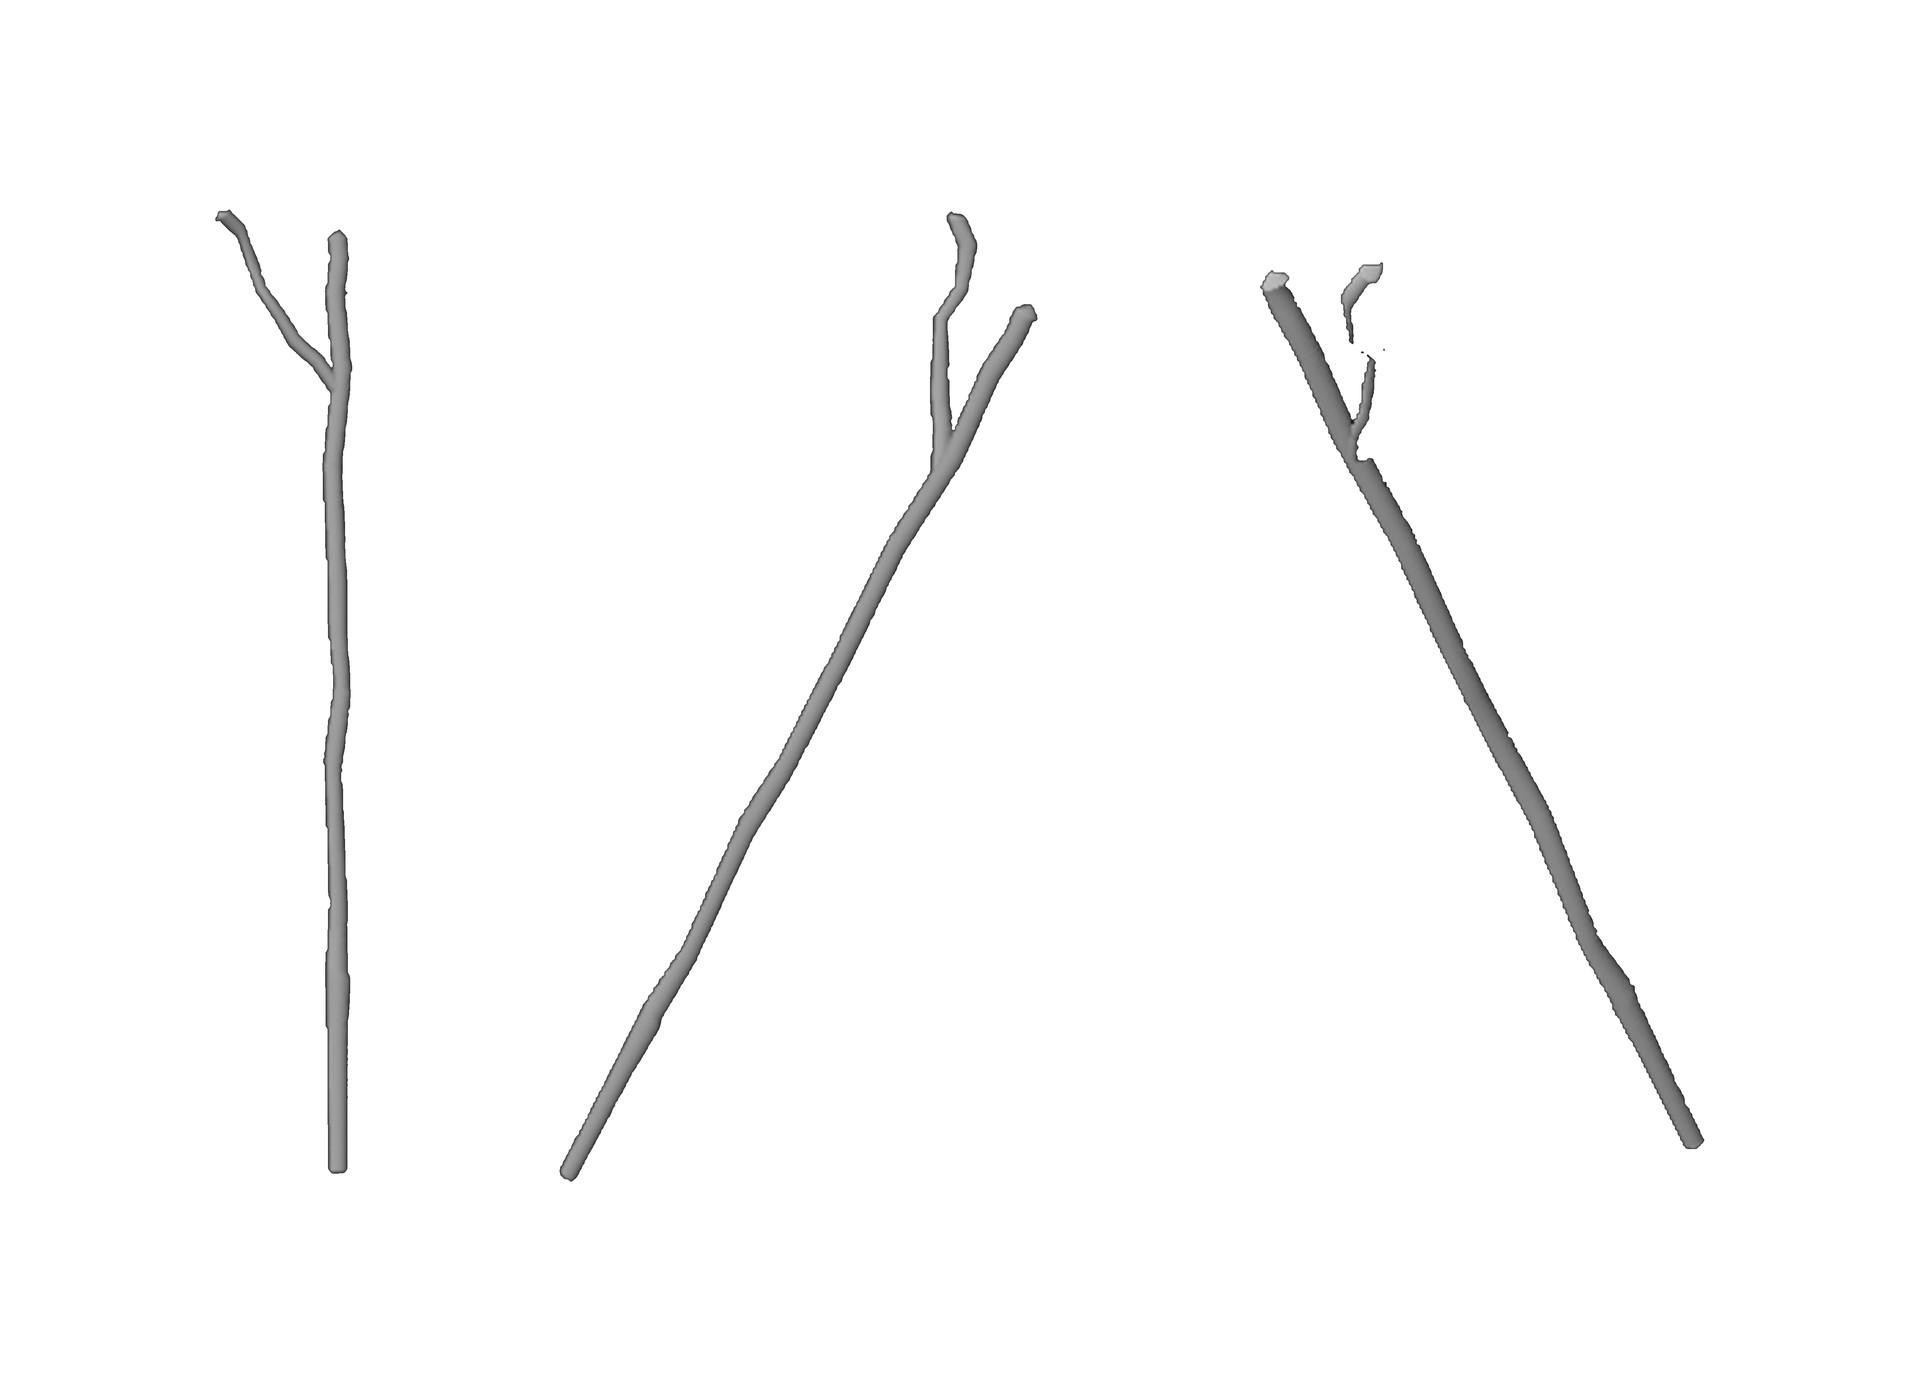 Prop - Nanu's staff (process)